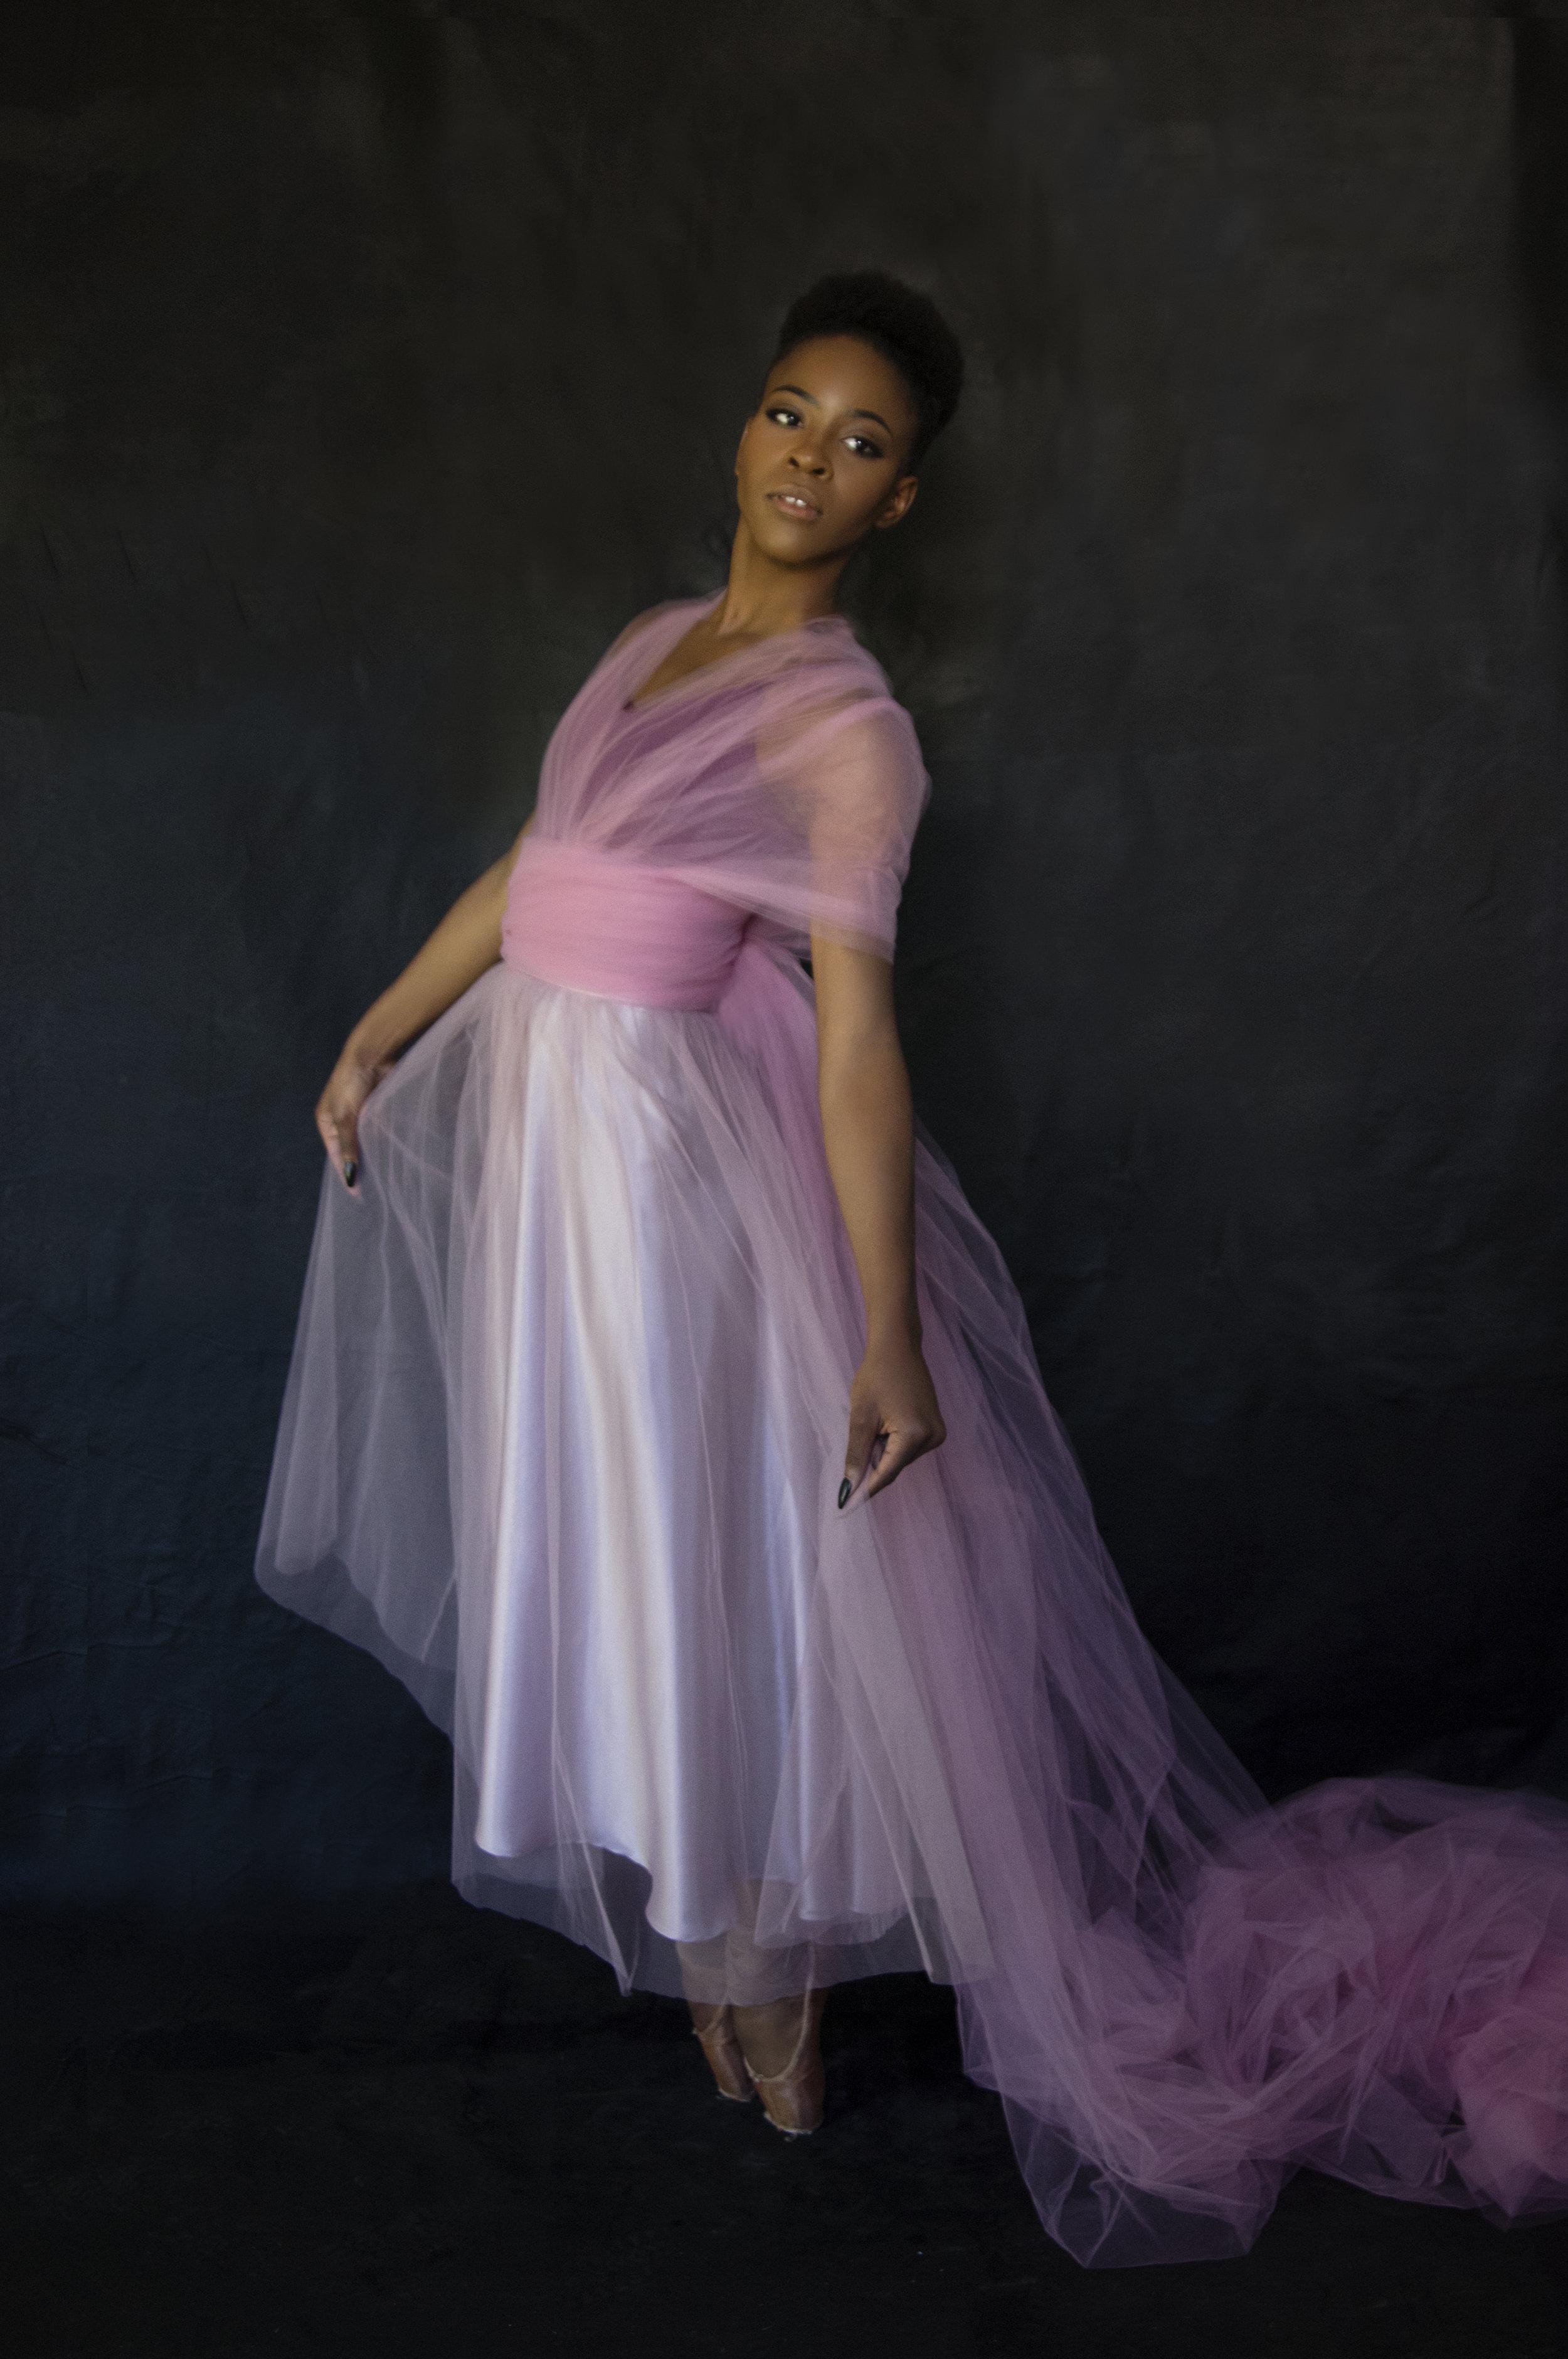 Heirloom Portrait of a Dancer